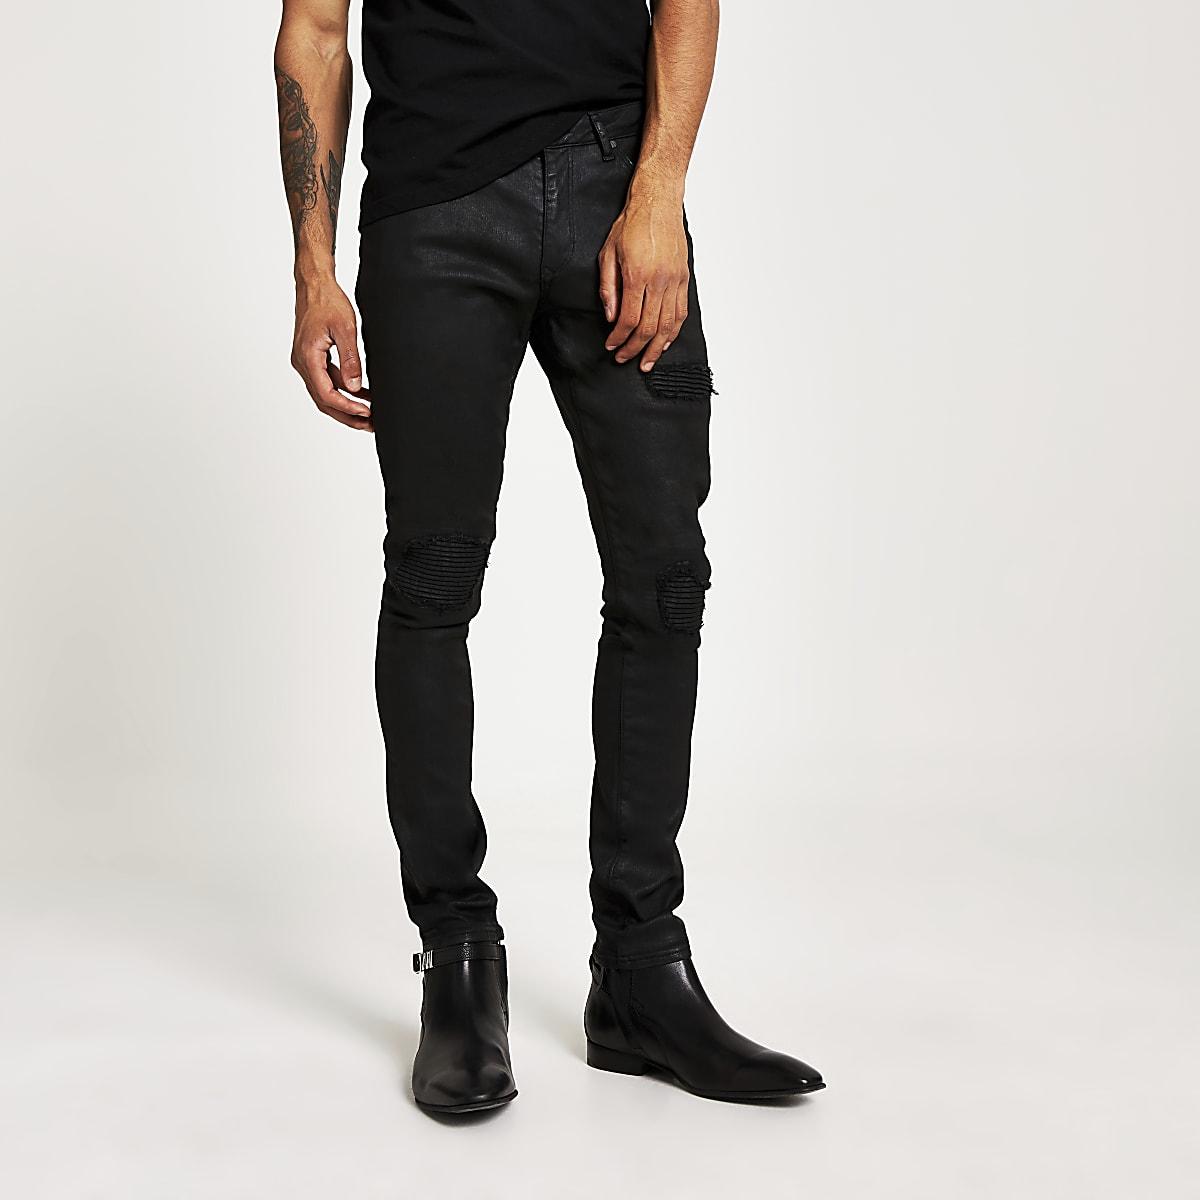 Danny – Jean super skinny noir enduit style motard